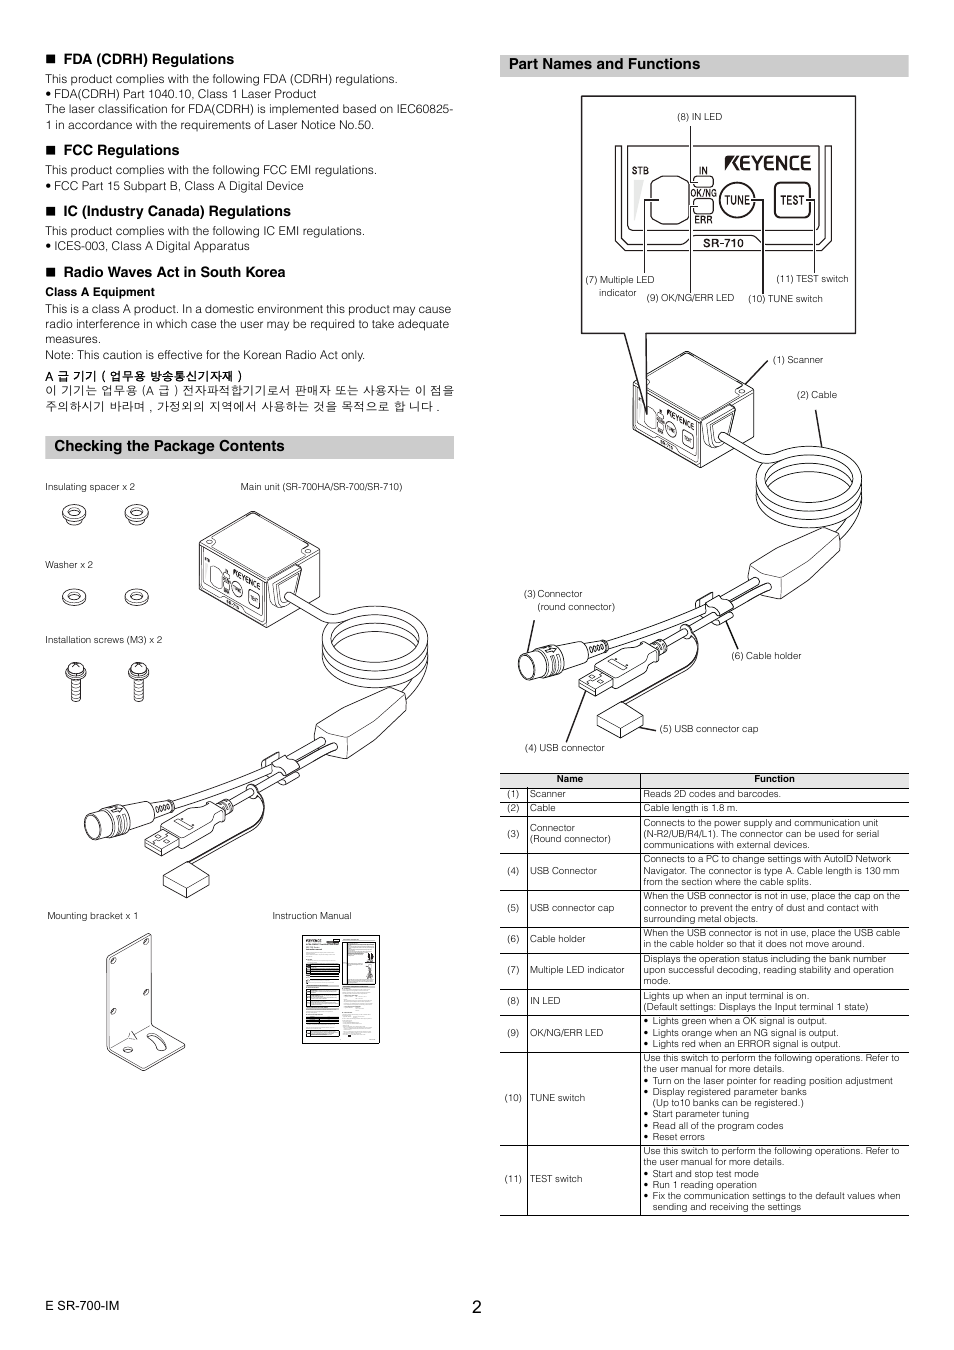 Keyence N-R2 Code Reader Dedicated Communication Unit RS-232C SR-700 series